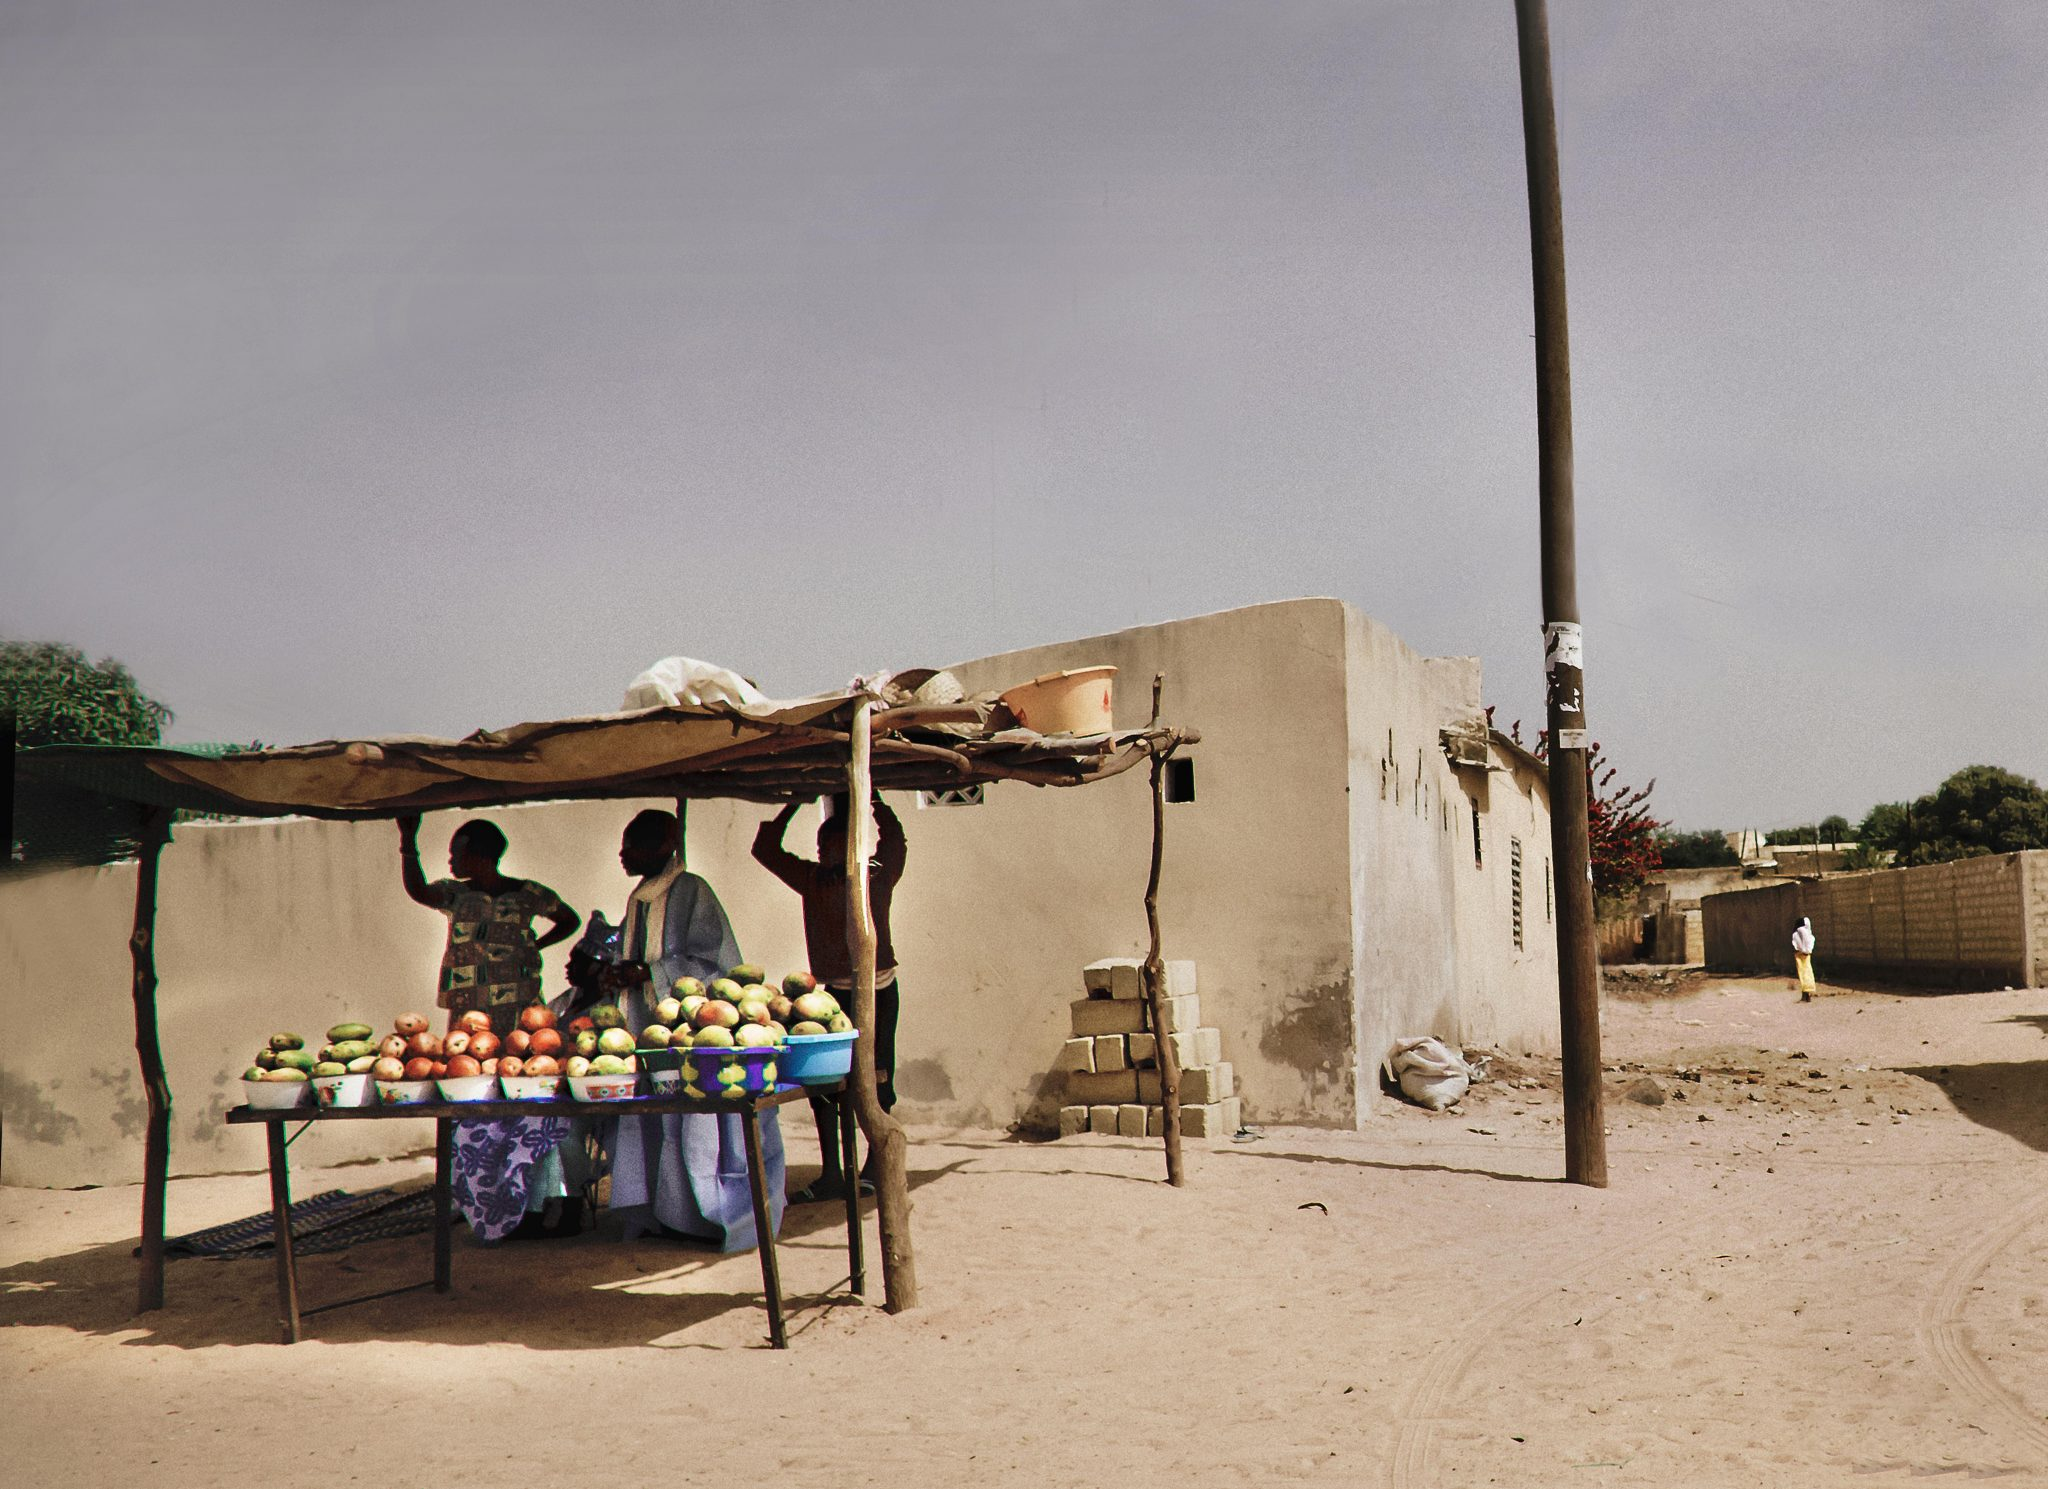 Fruit Stand, Raphael, Senegal